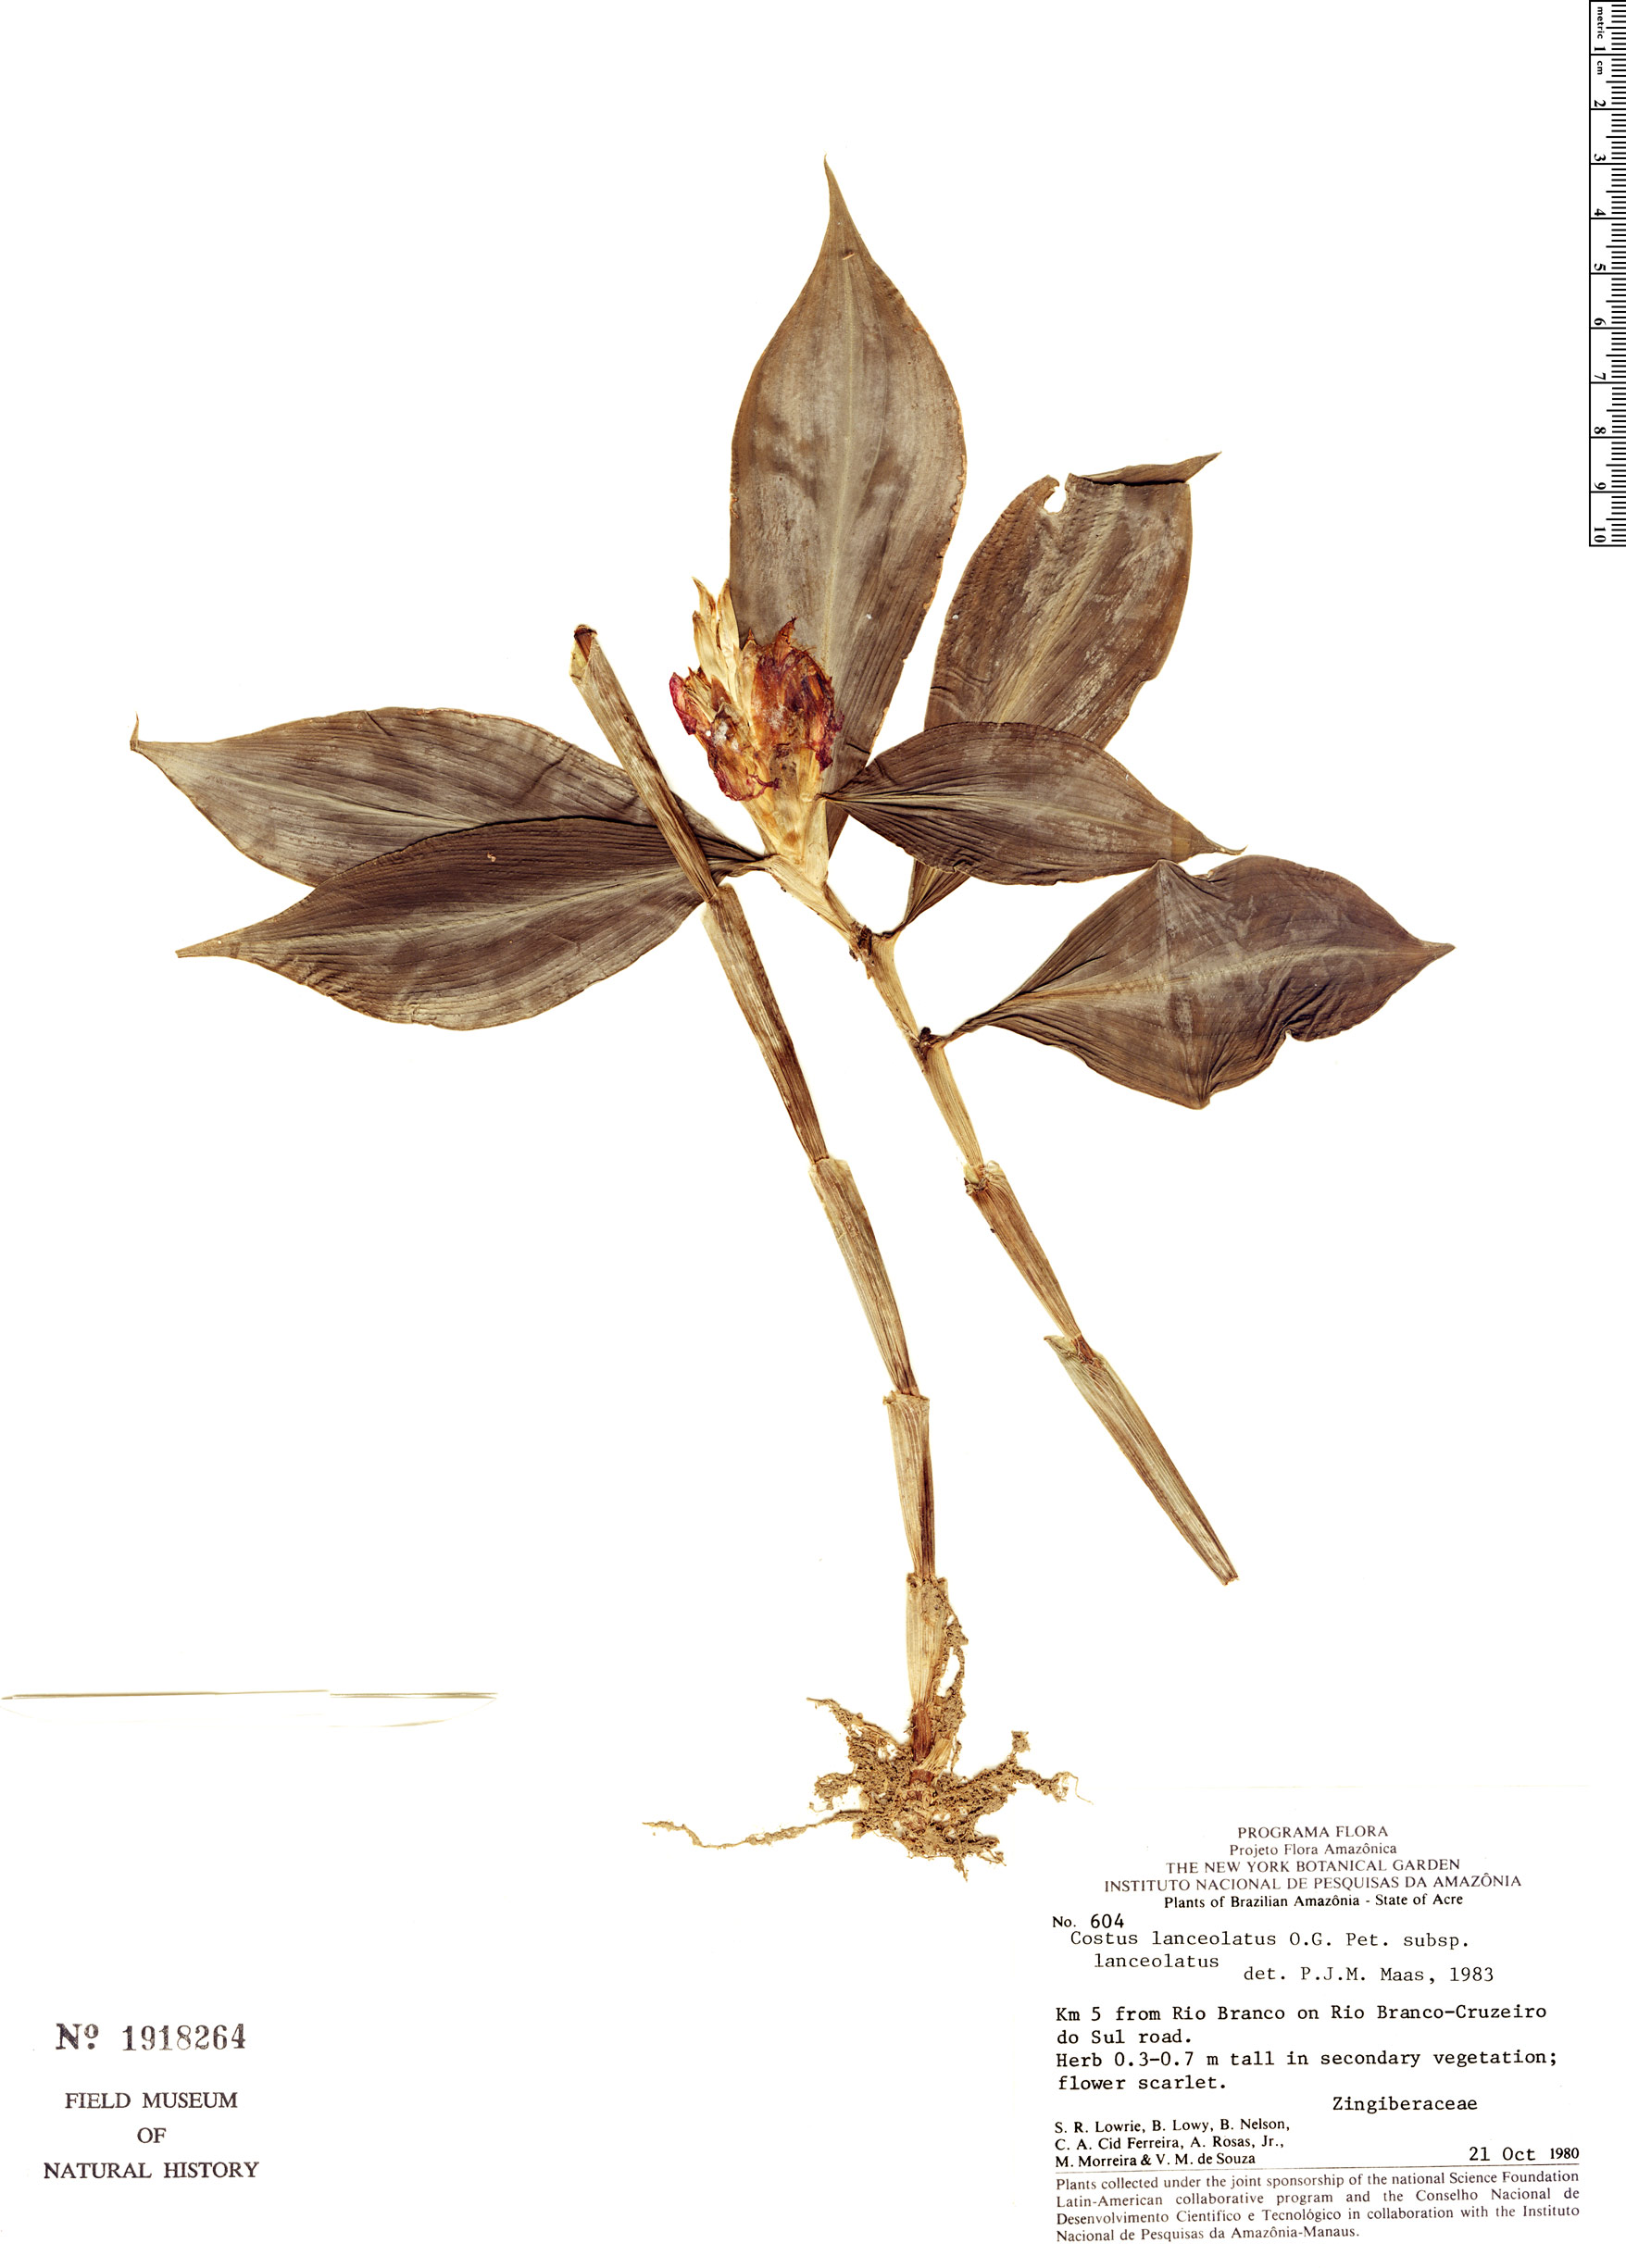 Specimen: Chamaecostus lanceolatus